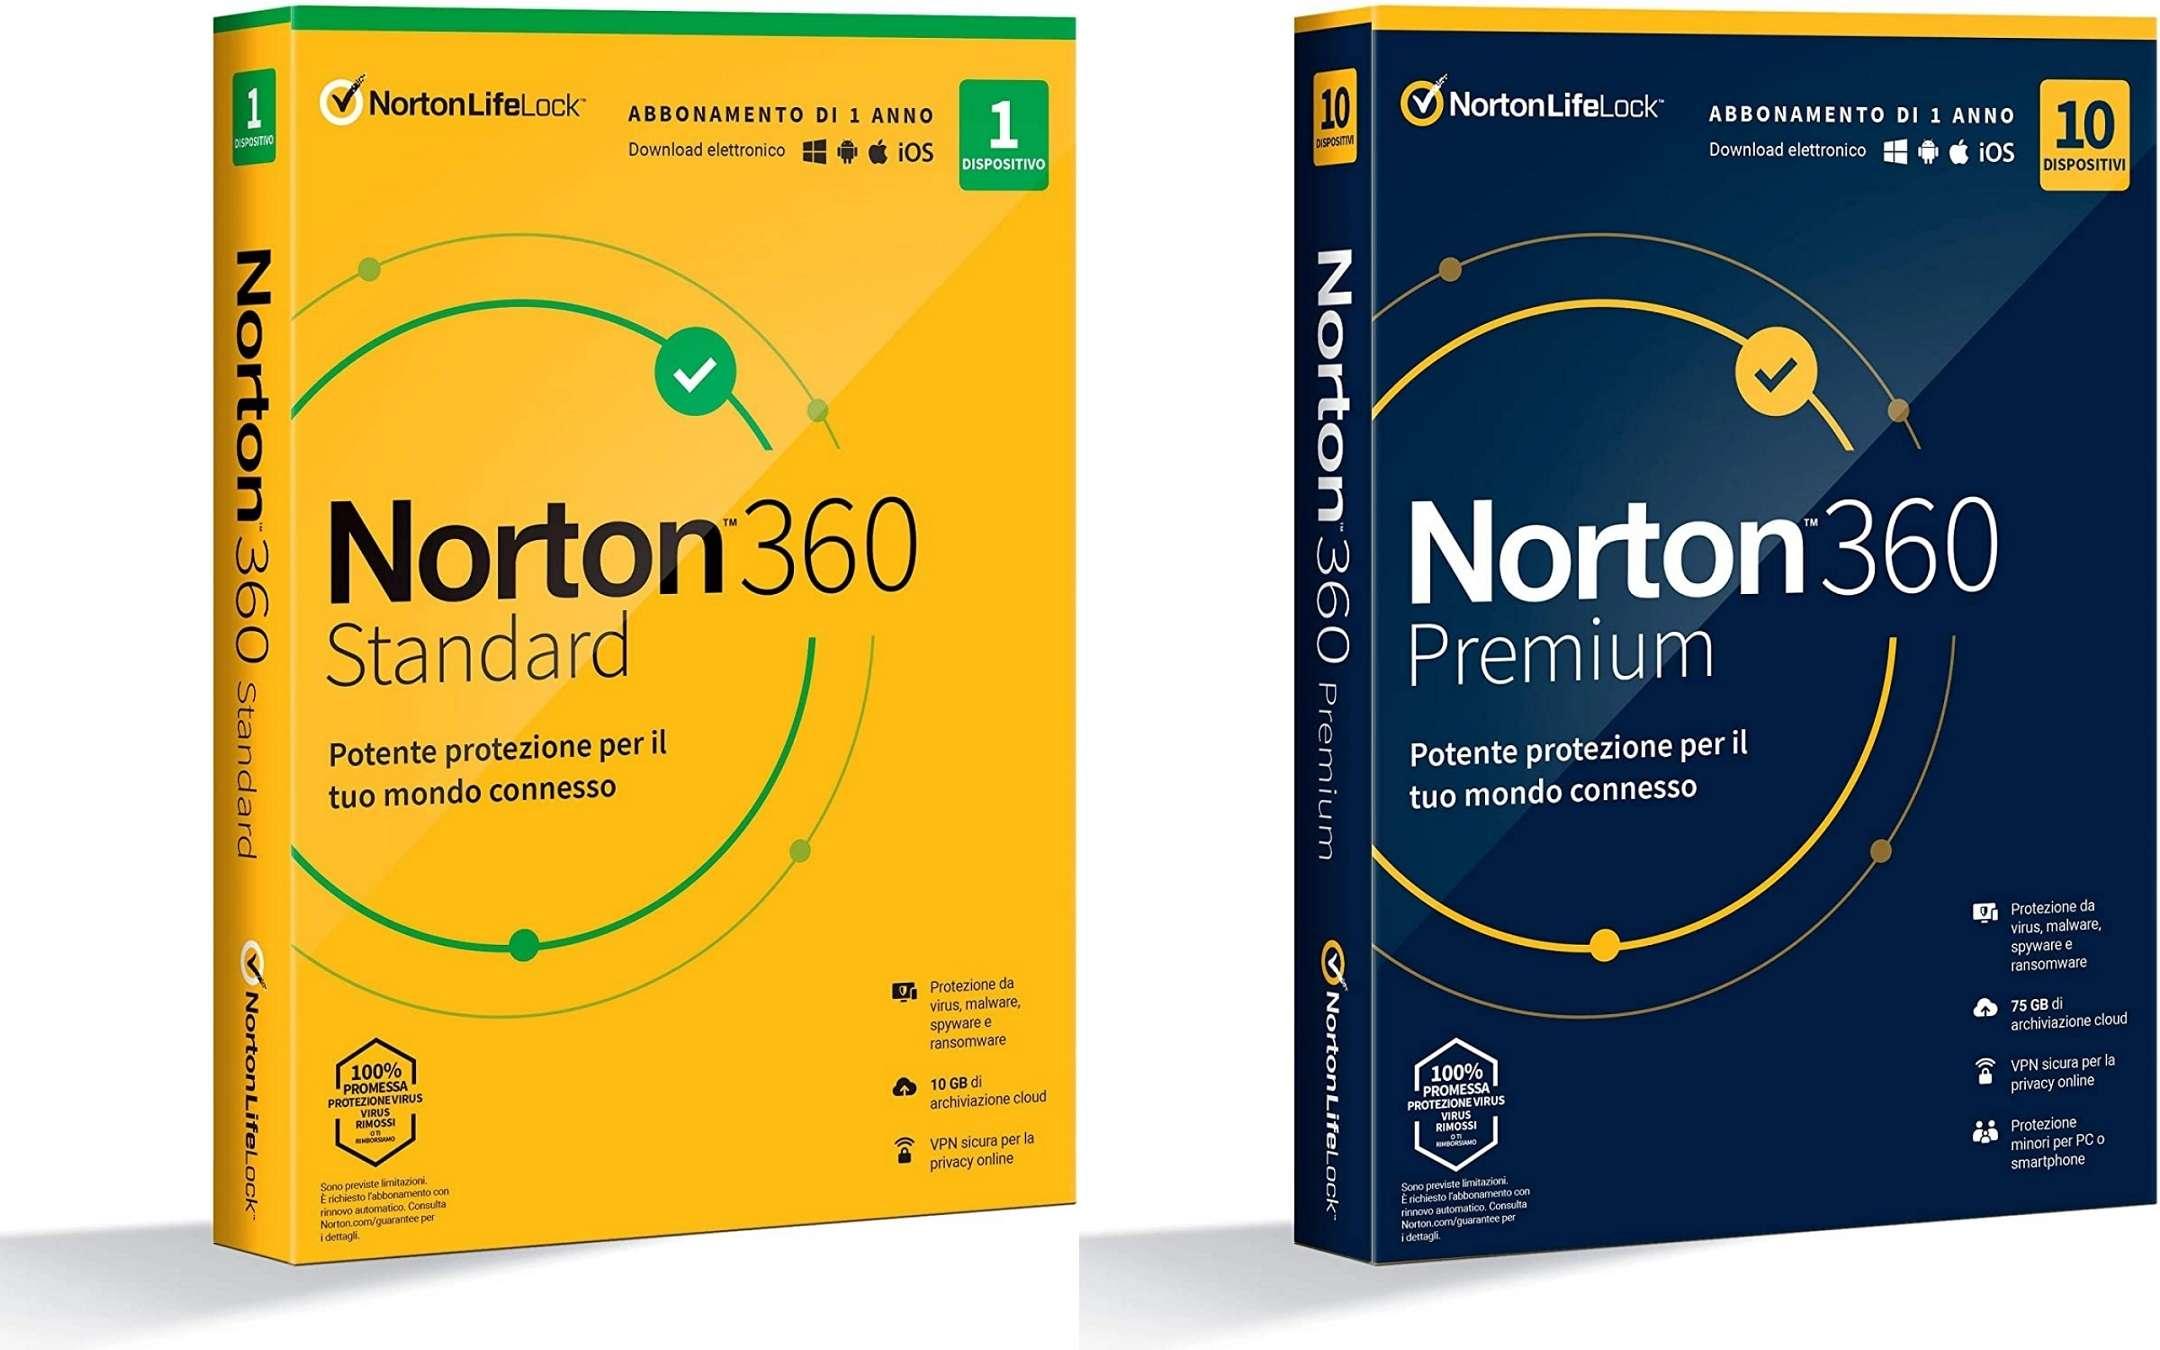 Norton 360 Standard and Premium on offer on Amazon